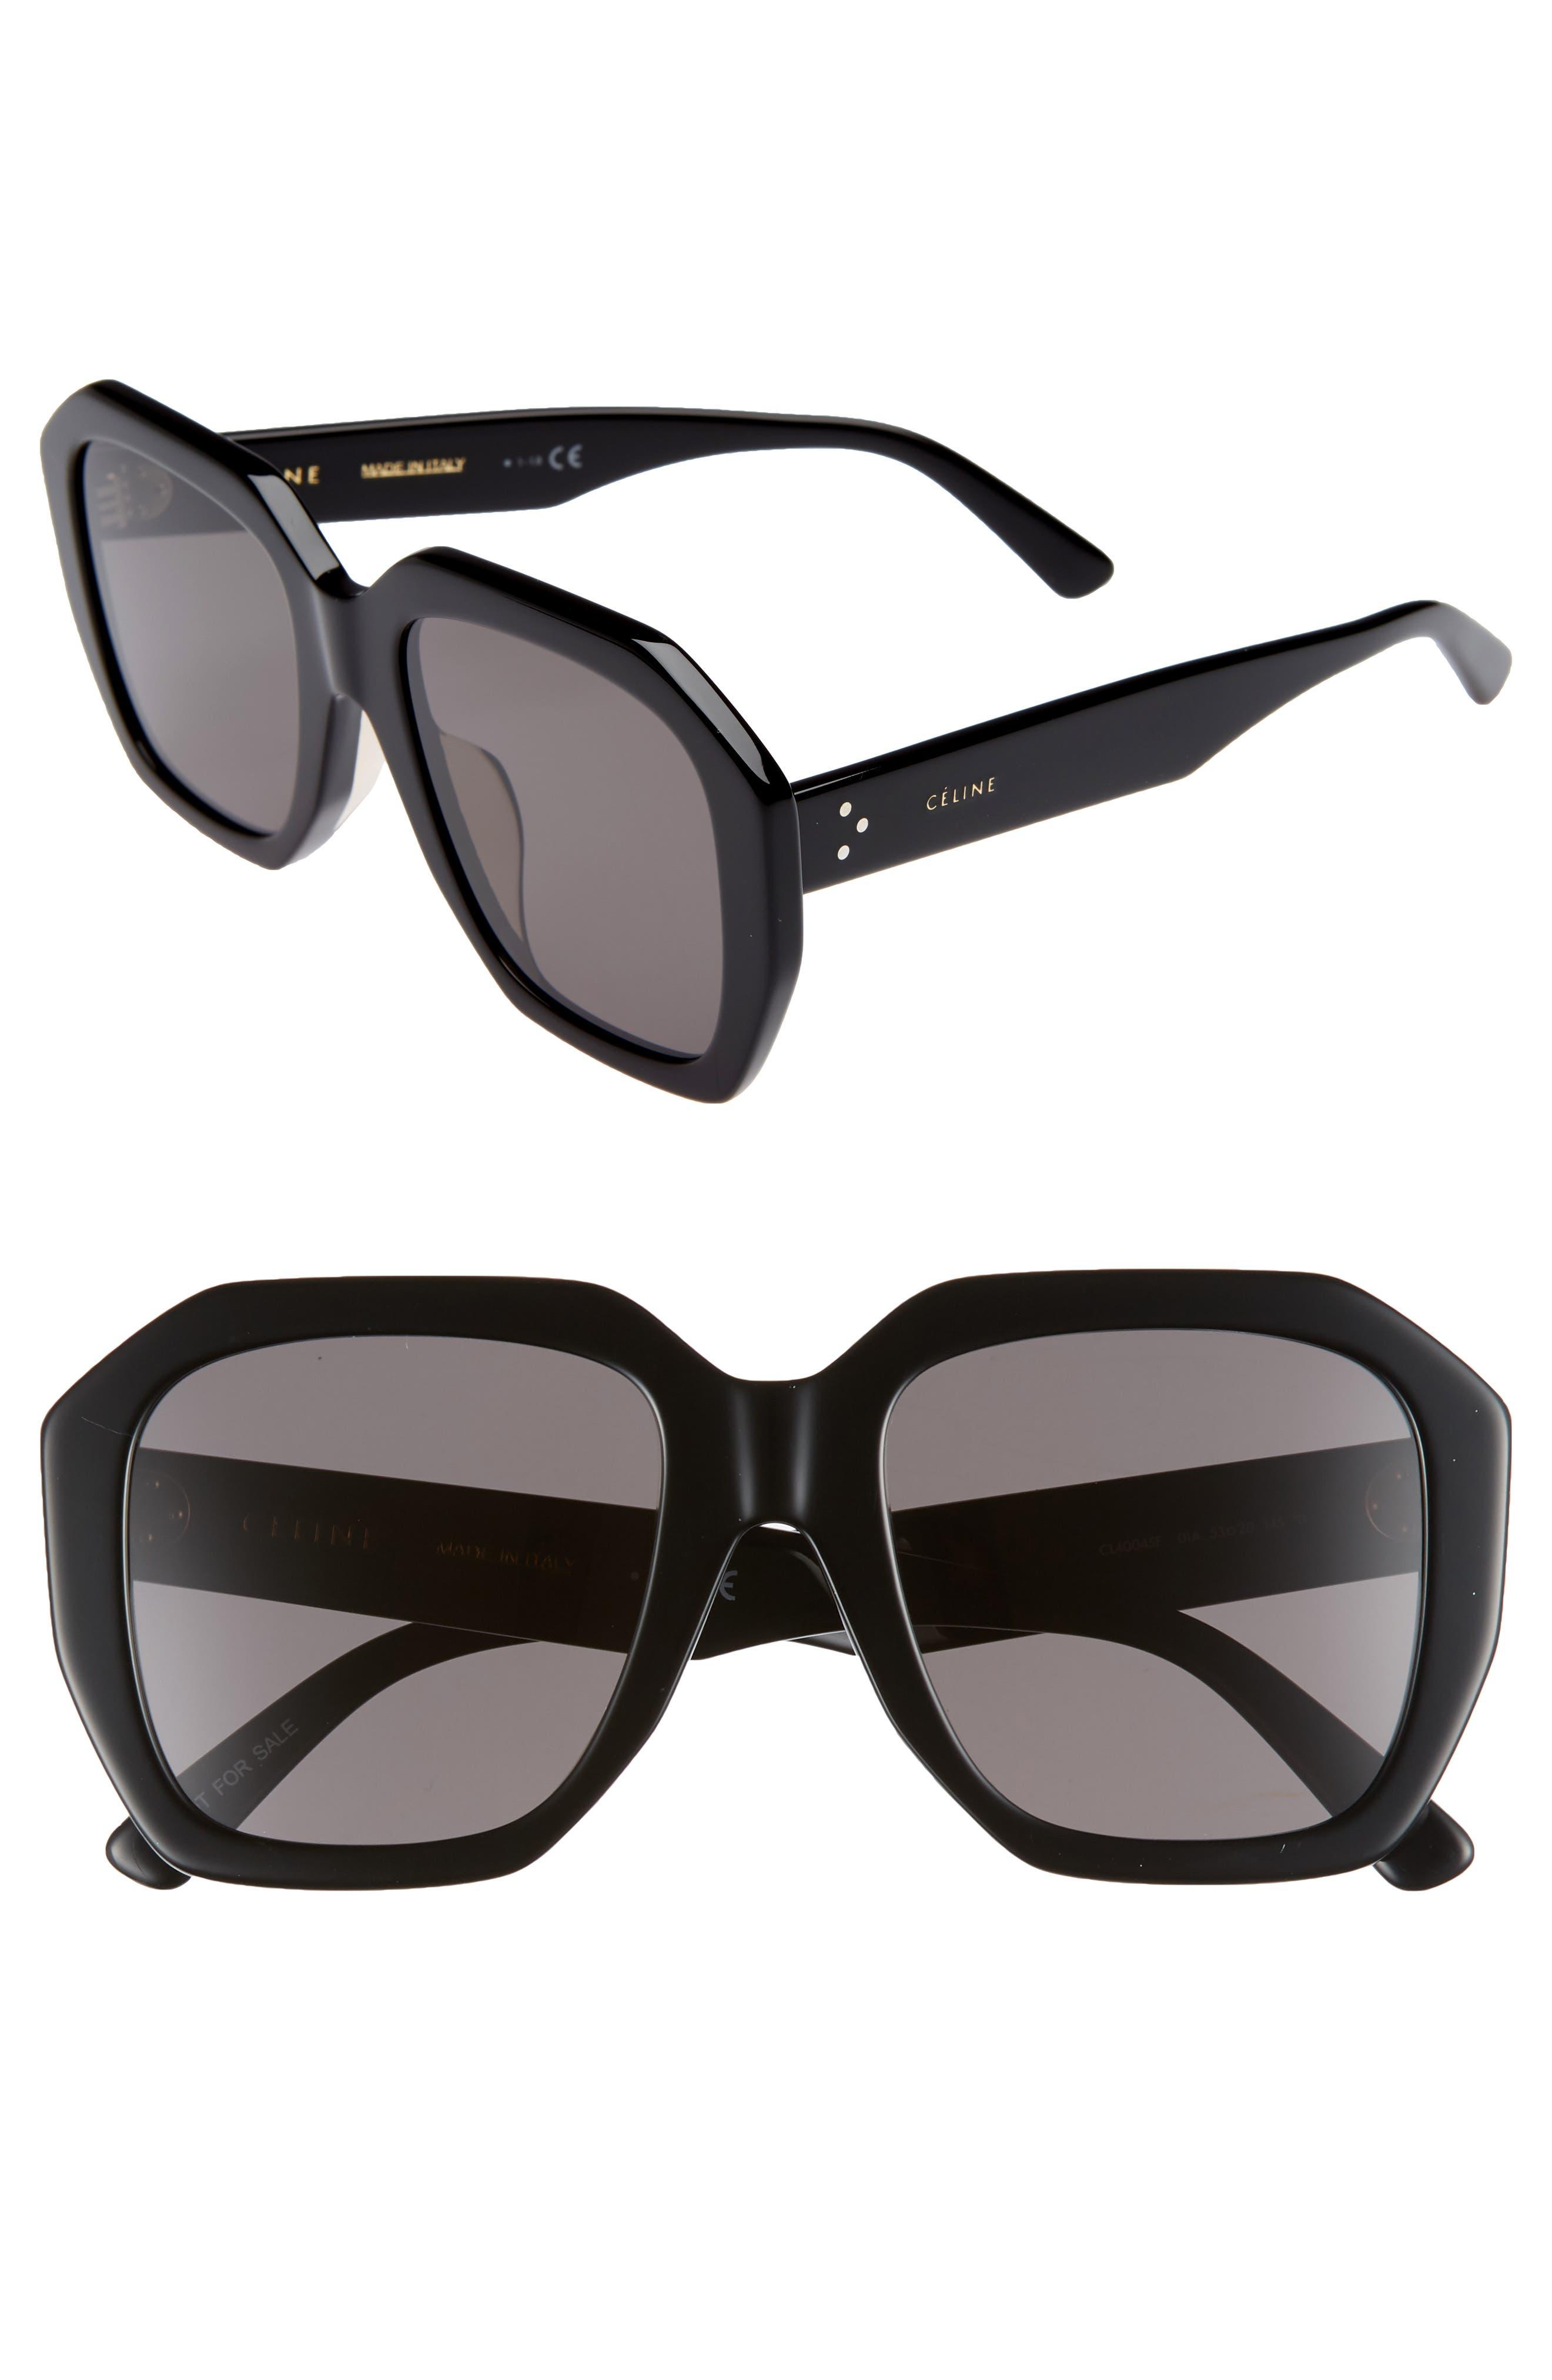 Square Universal-Fit Acetate Sunglasses in Black